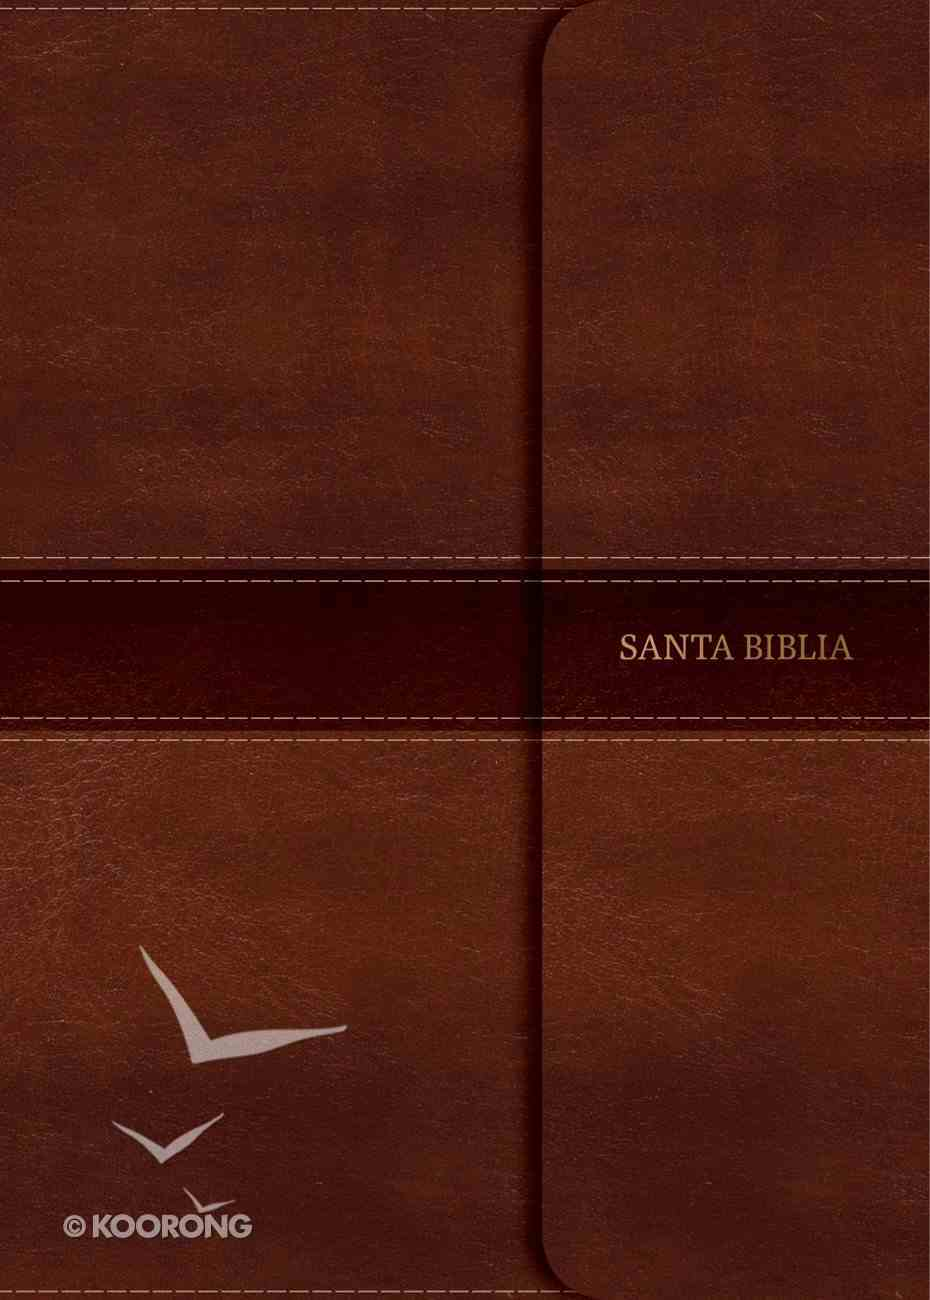 Nvi Biblia Letra Gigante Marron Indice Y Solapa Con Iman (Giant Print Indexed Magnetic Flap) Imitation Leather